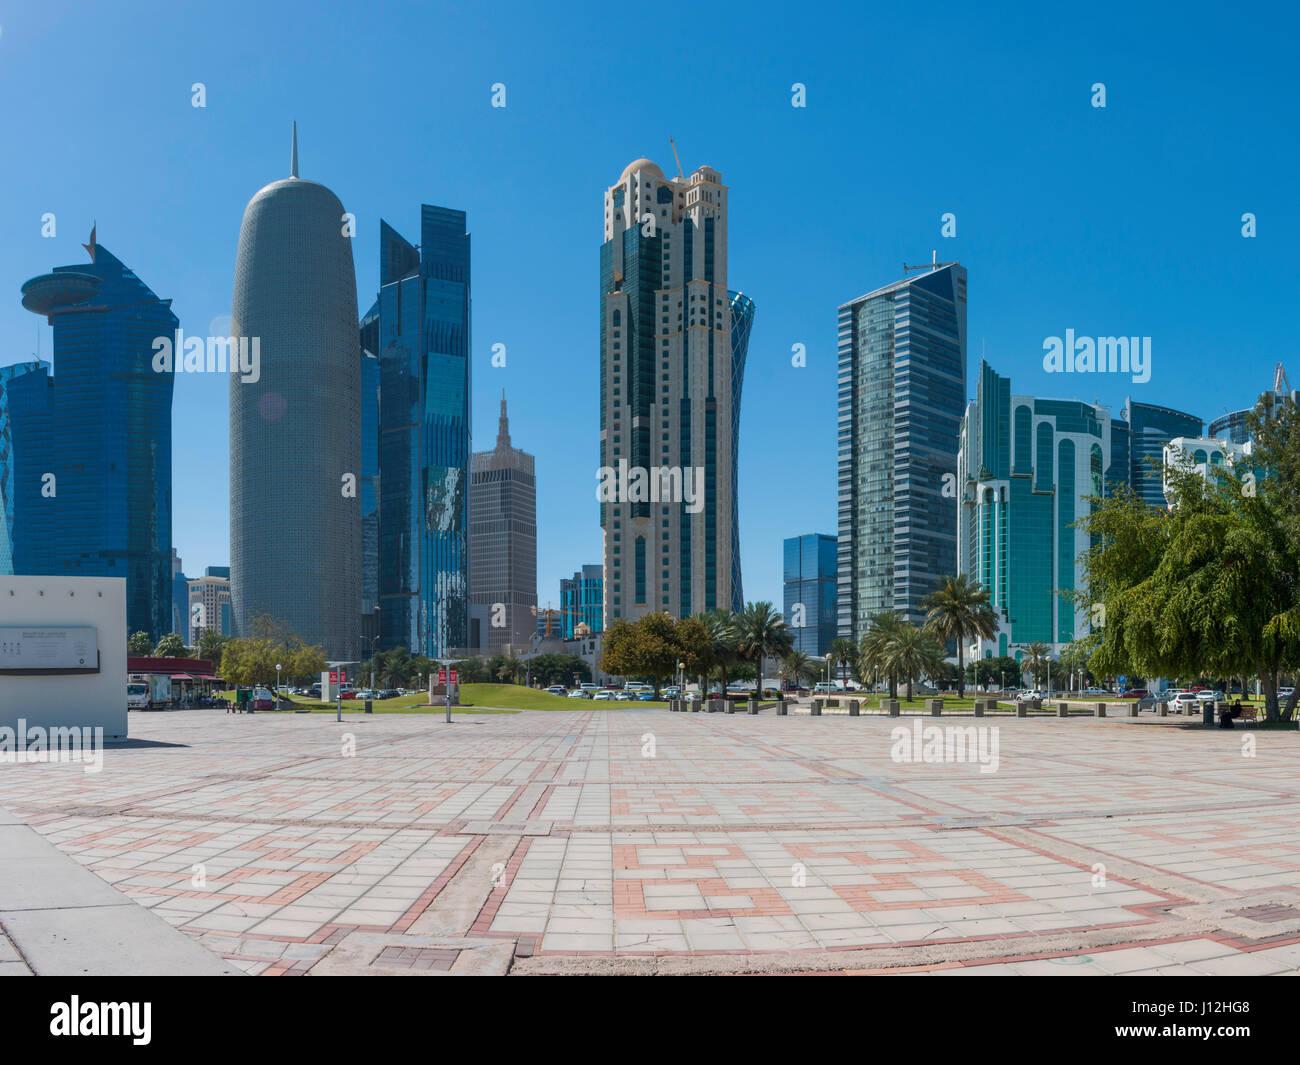 Downtown Doha, Qatar Stock Photo